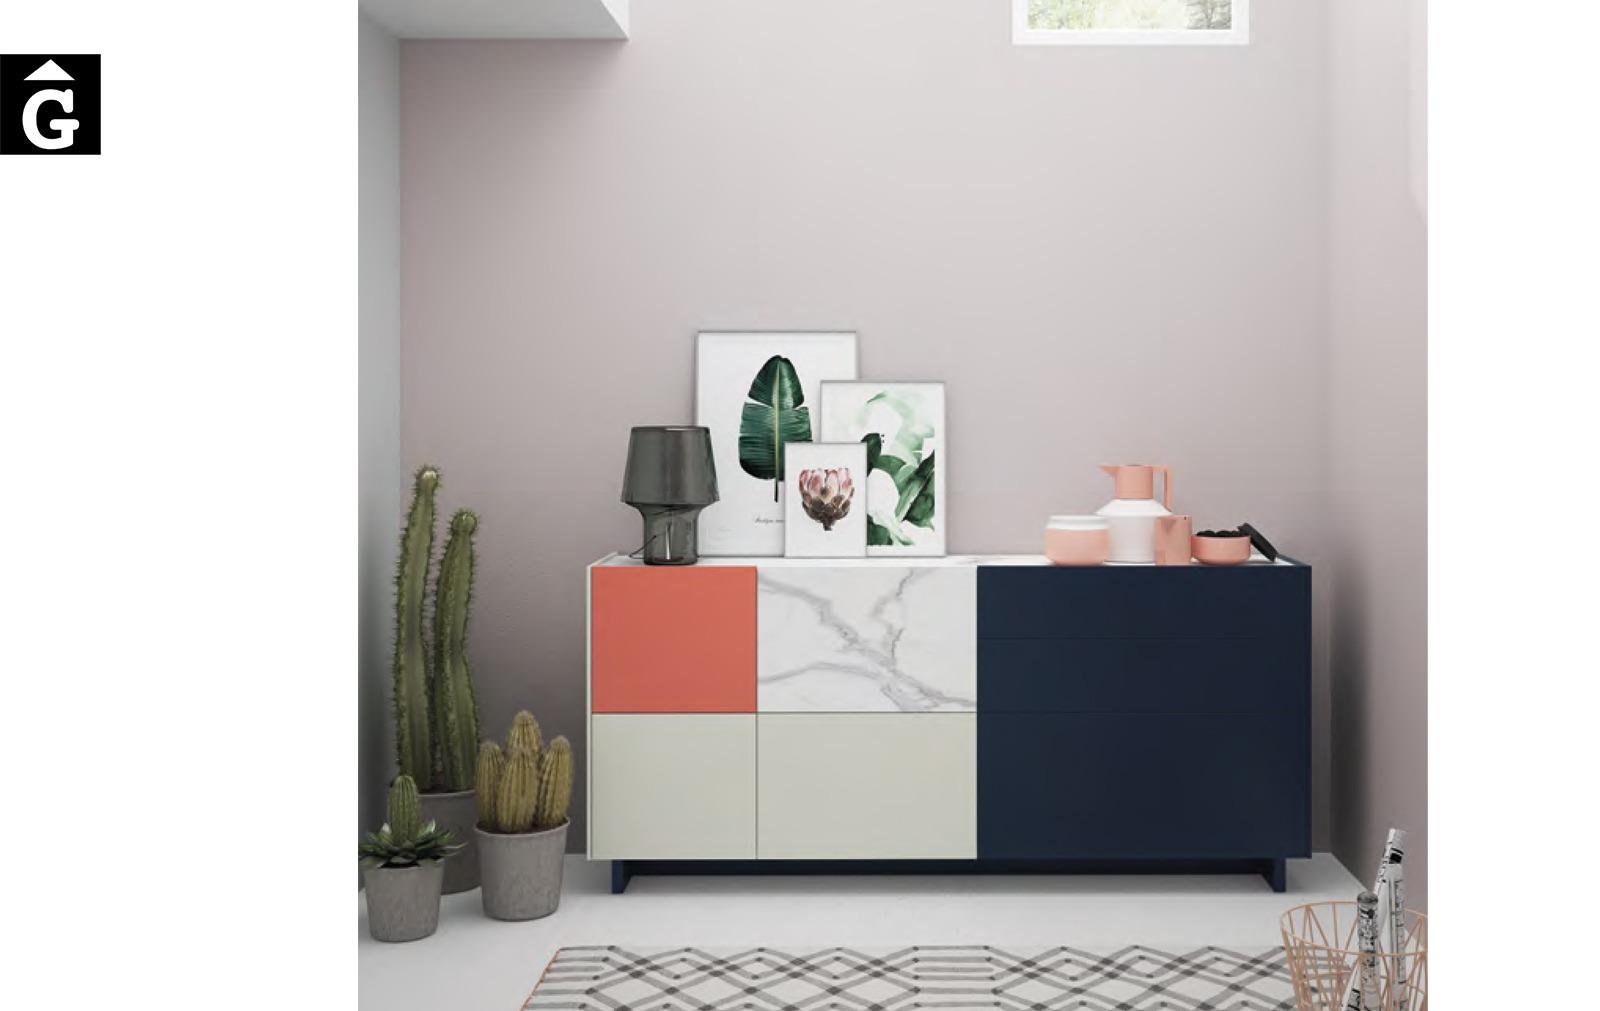 On Plus moble bufet aparador lacat mate ViVe muebles Verge programa mobles menjador rebedor living by mobles Gifreu